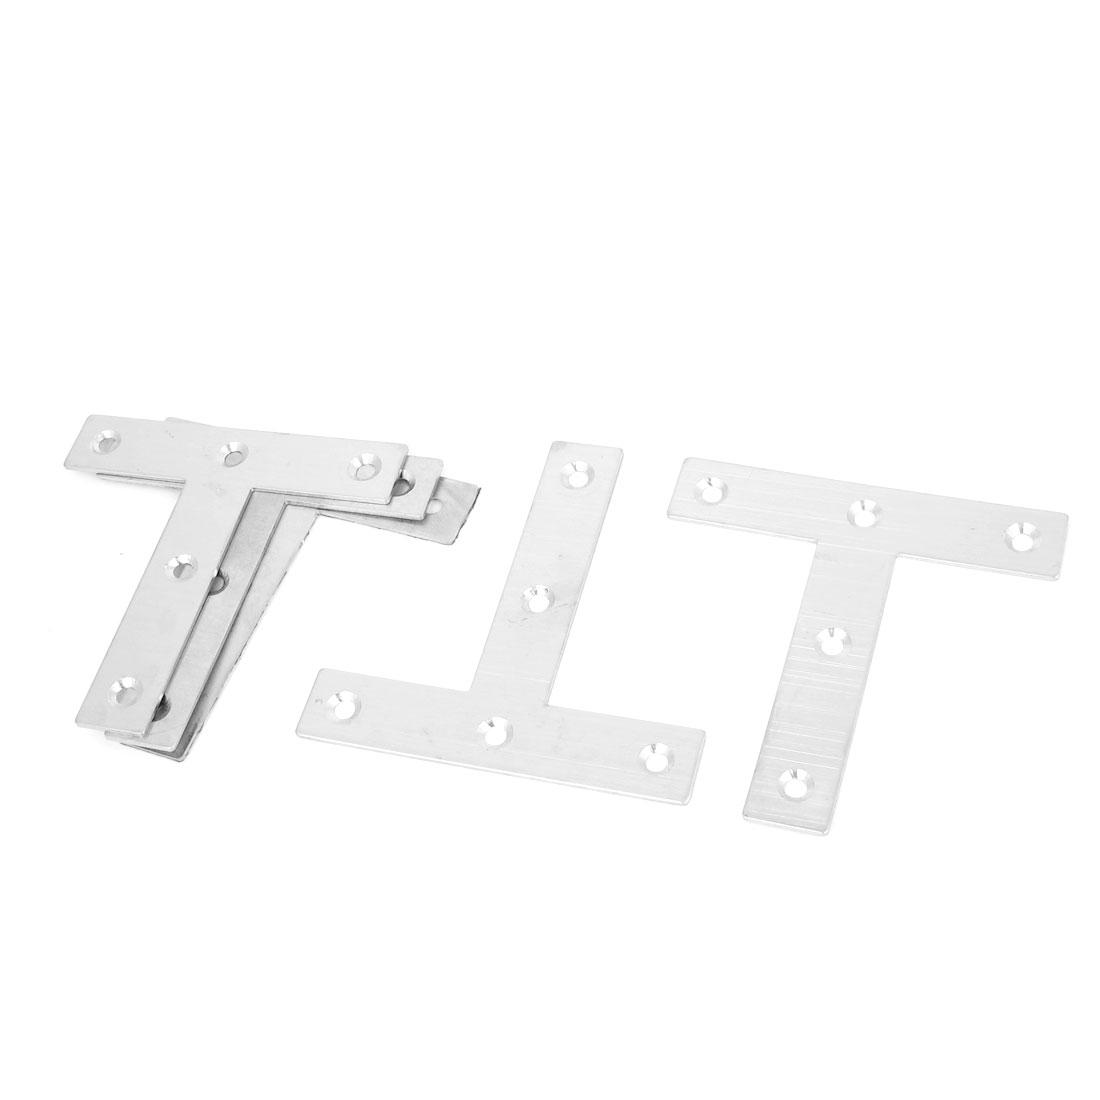 80mmx80mm Flat T Shape Corner Brace Mending Plate Angle Brackets 5PCS